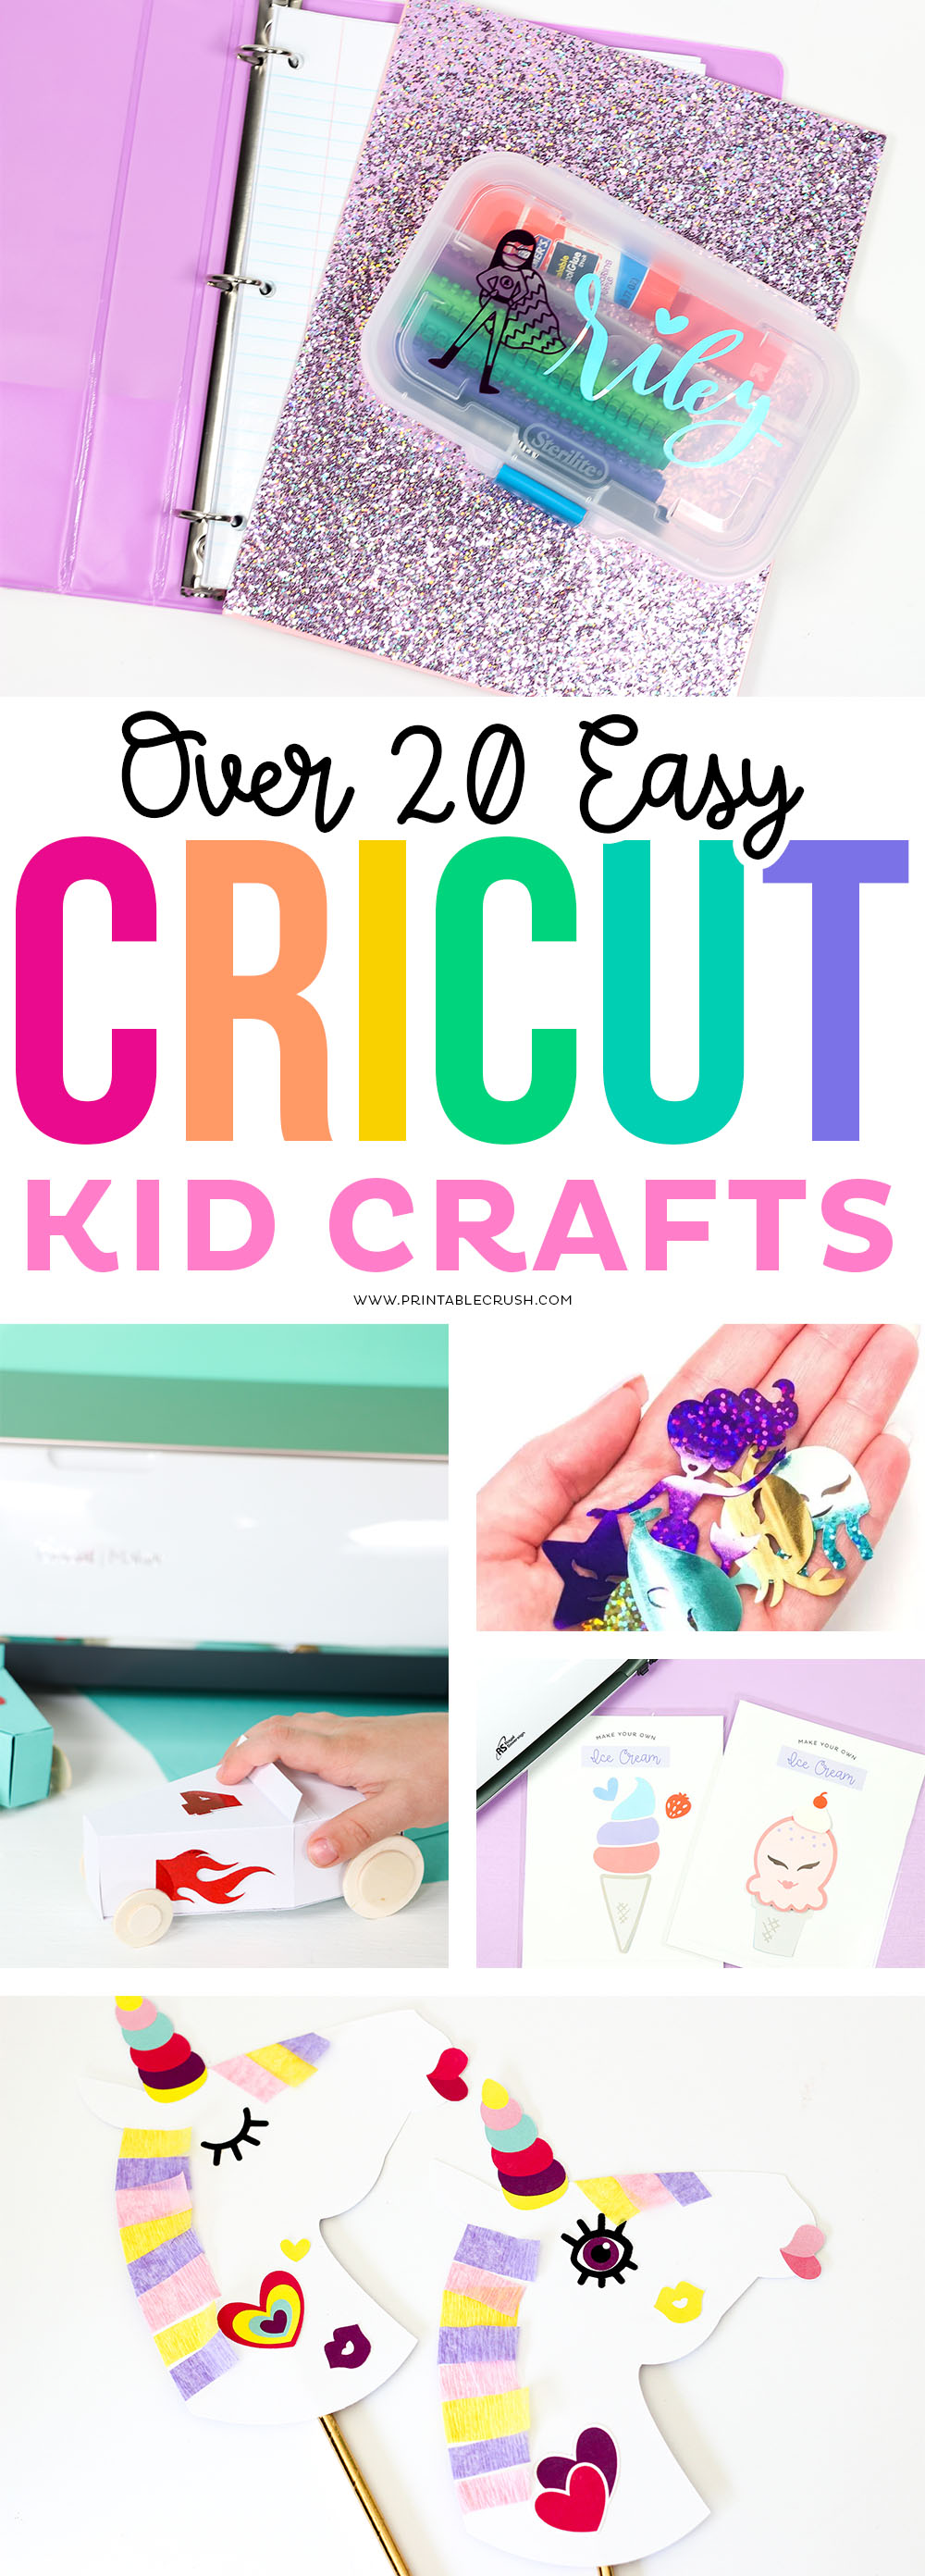 Easy Cricut Kid Crafts